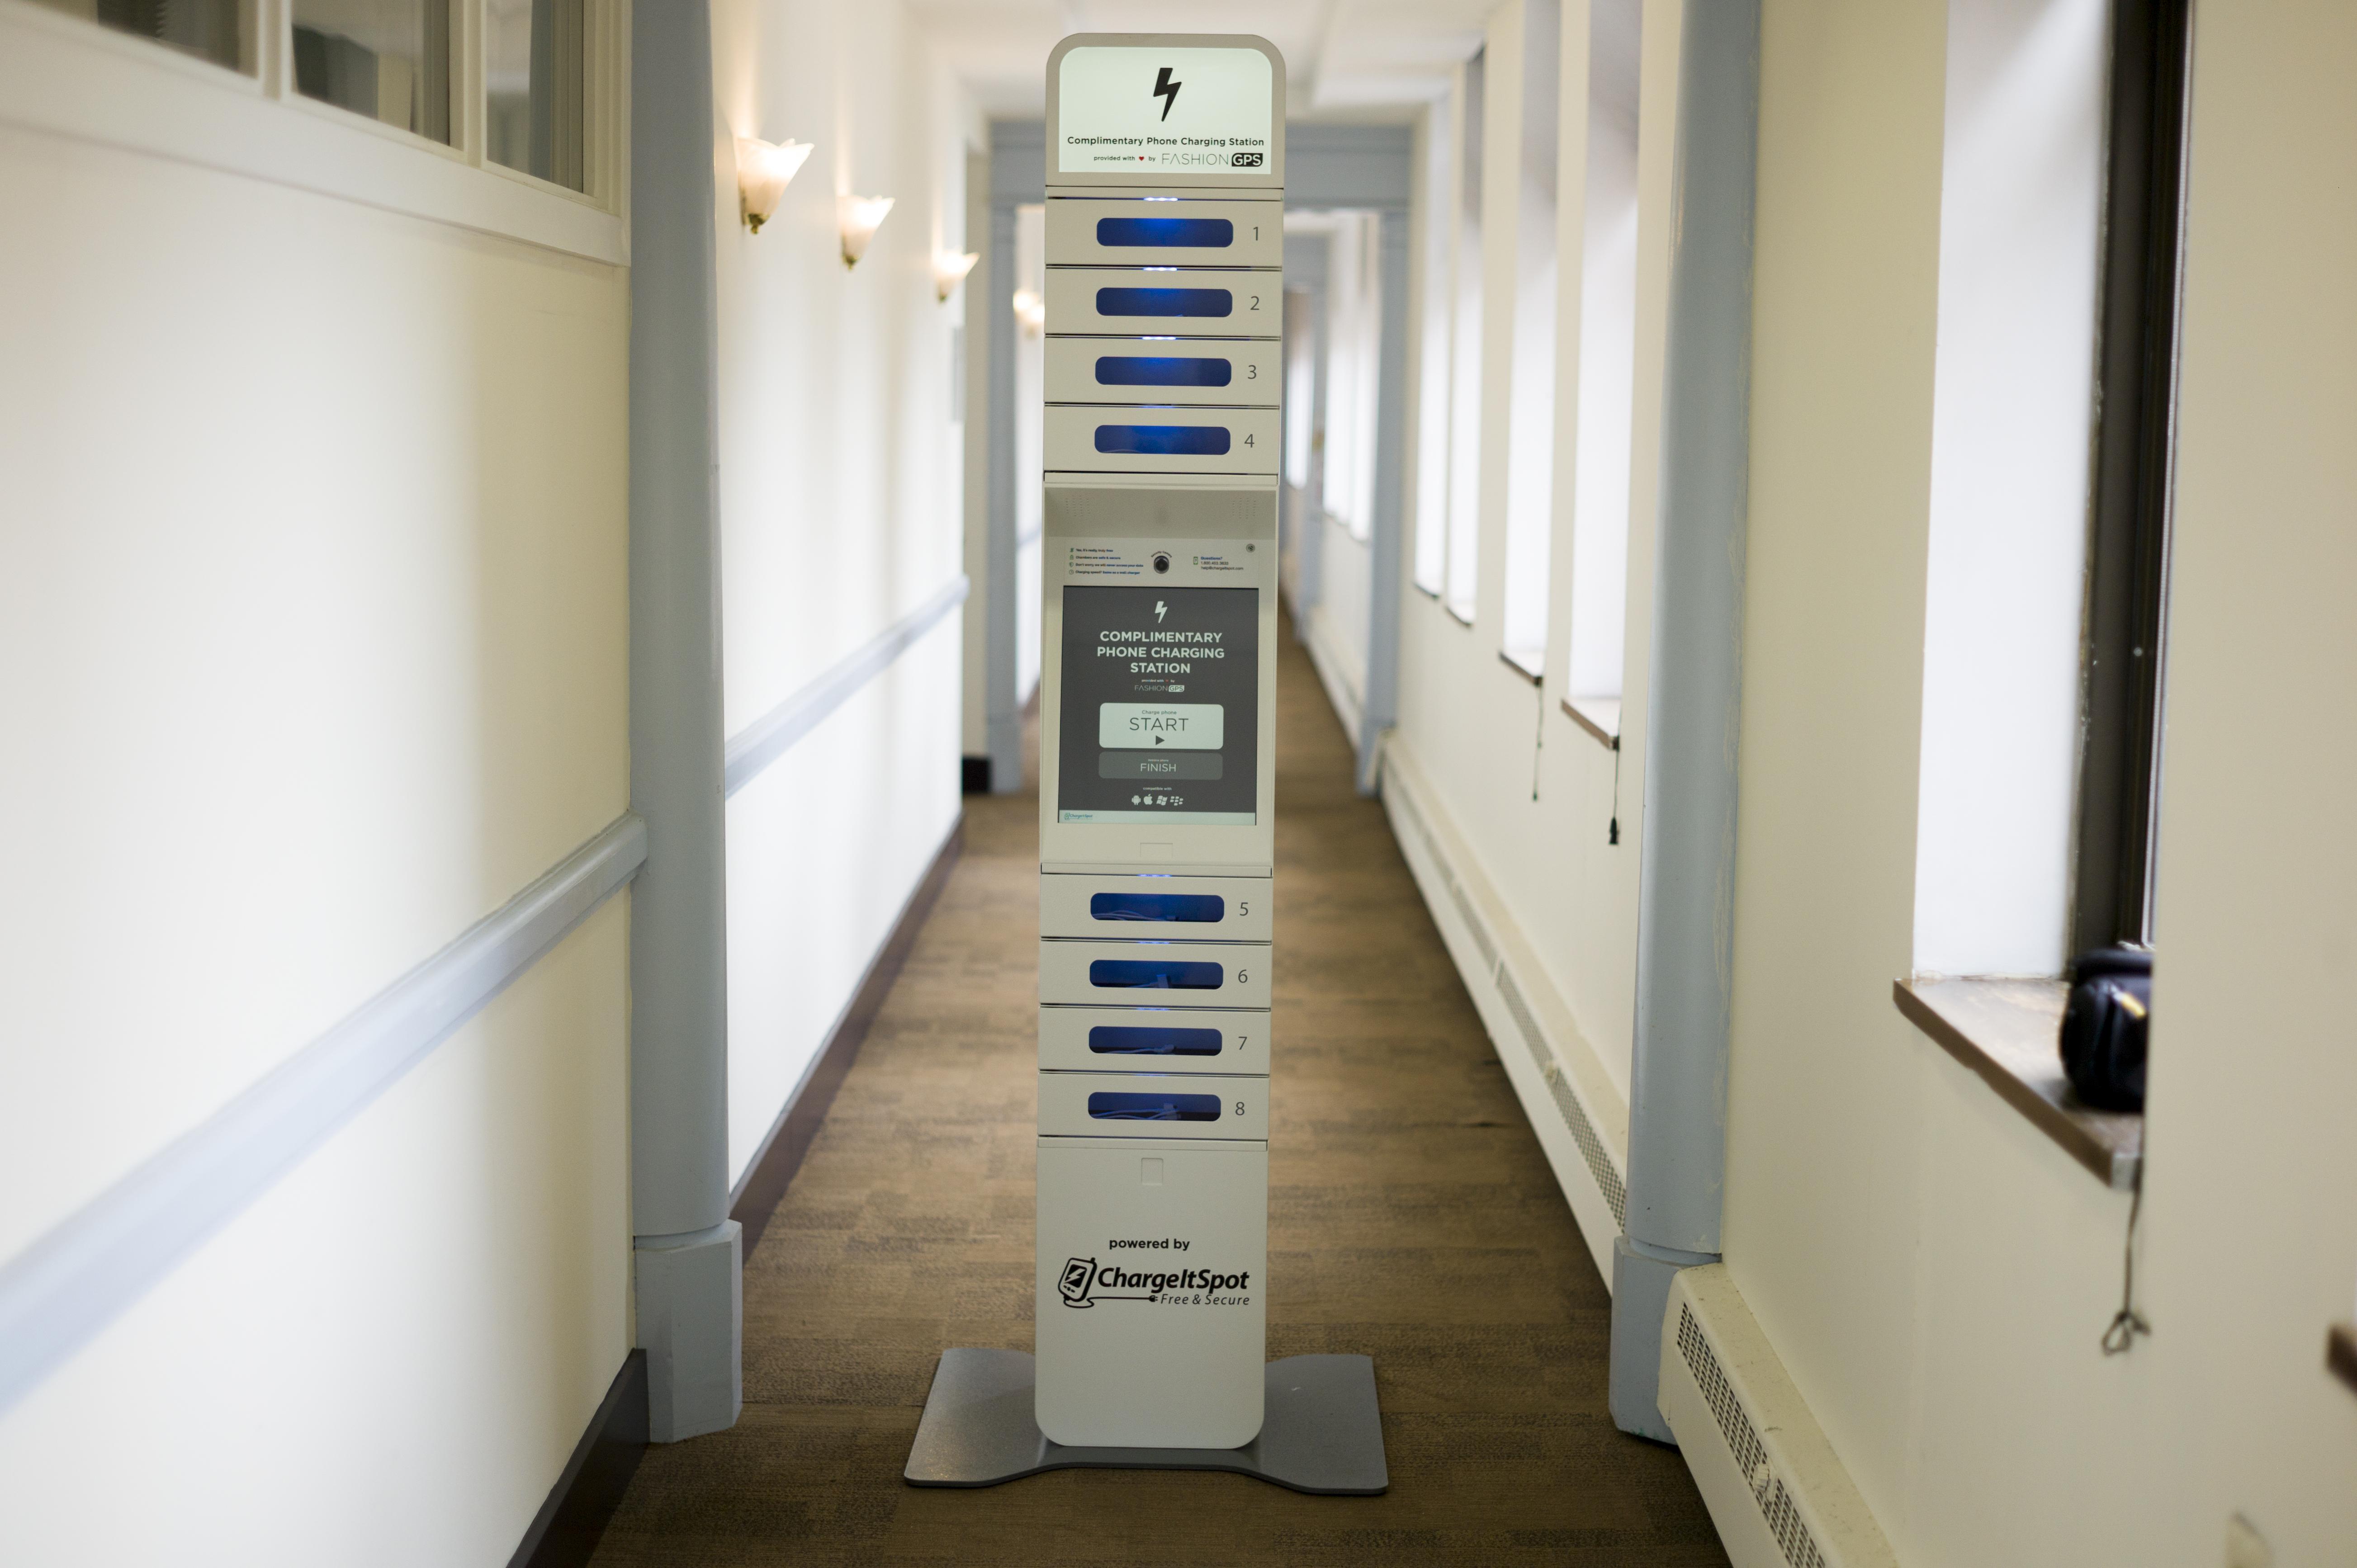 phone-charging-kiosk